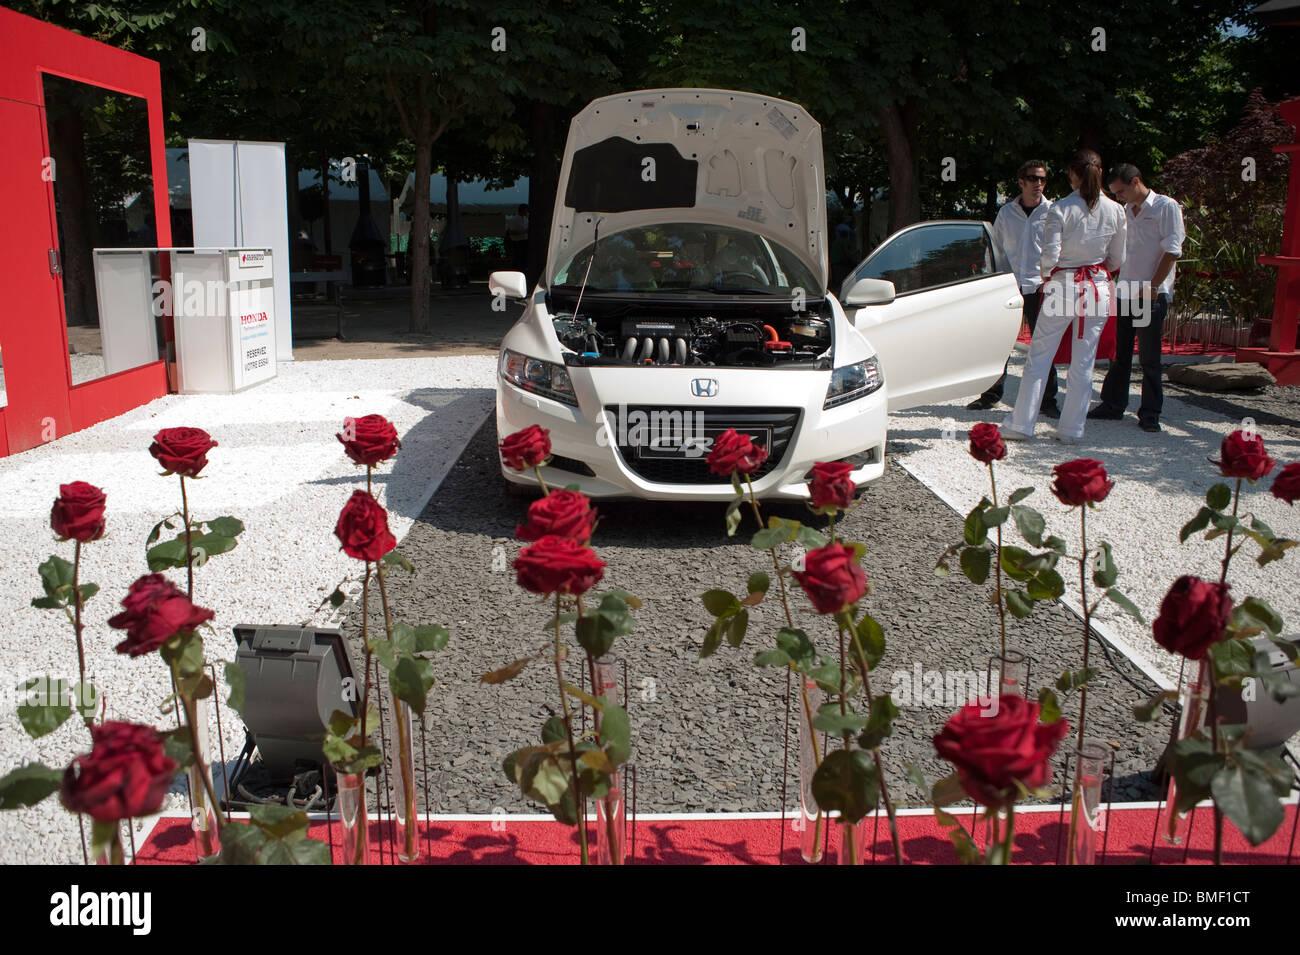 Japanese Hybrid Car, Honda CR-Z, on Display in Rose Garden, Garden Festival, Jardin des Tuileries, Paris, France Stock Photo